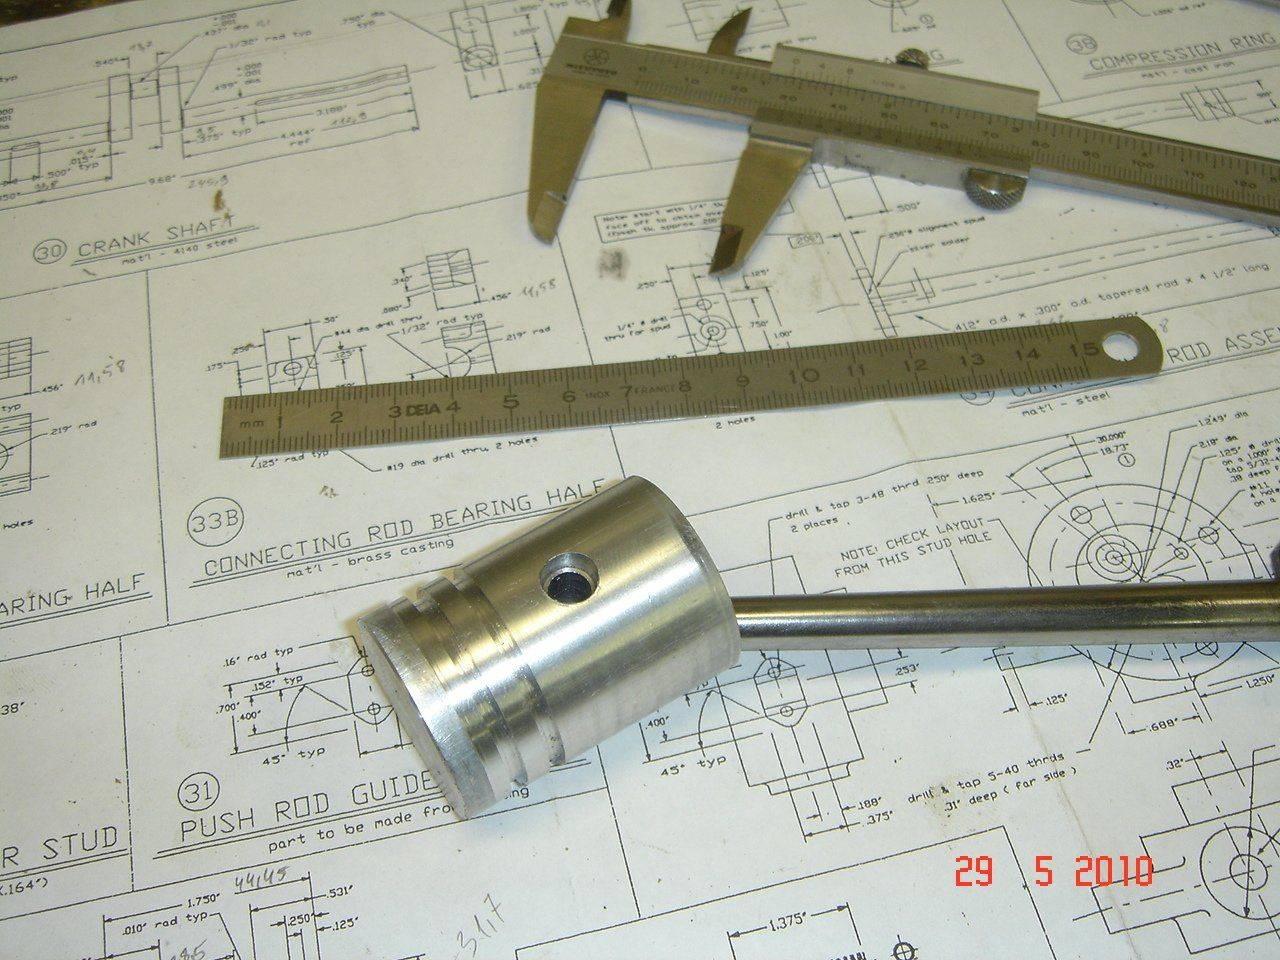 DSC00633.JPG